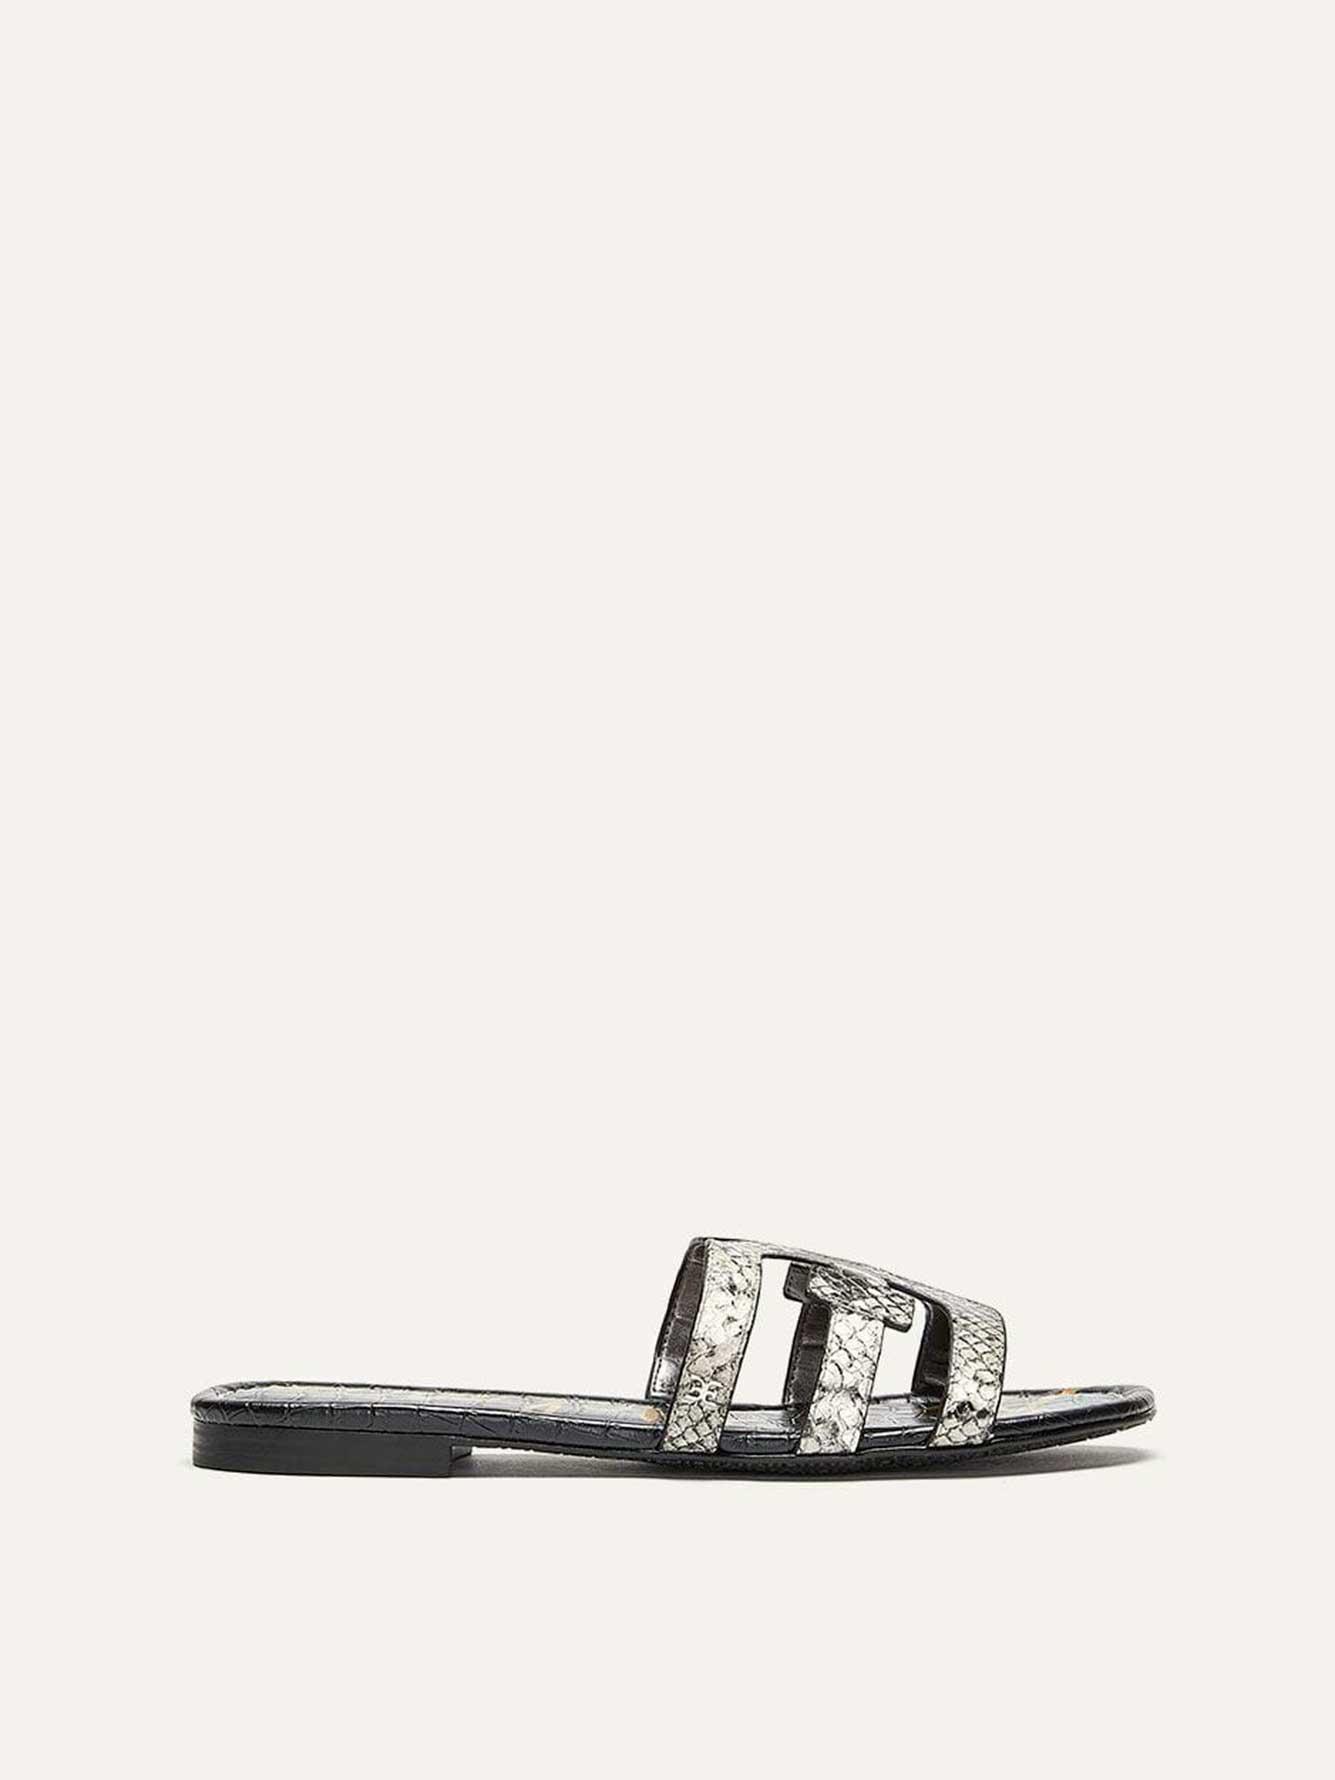 Wide Leather Sandals - Sam Edelman